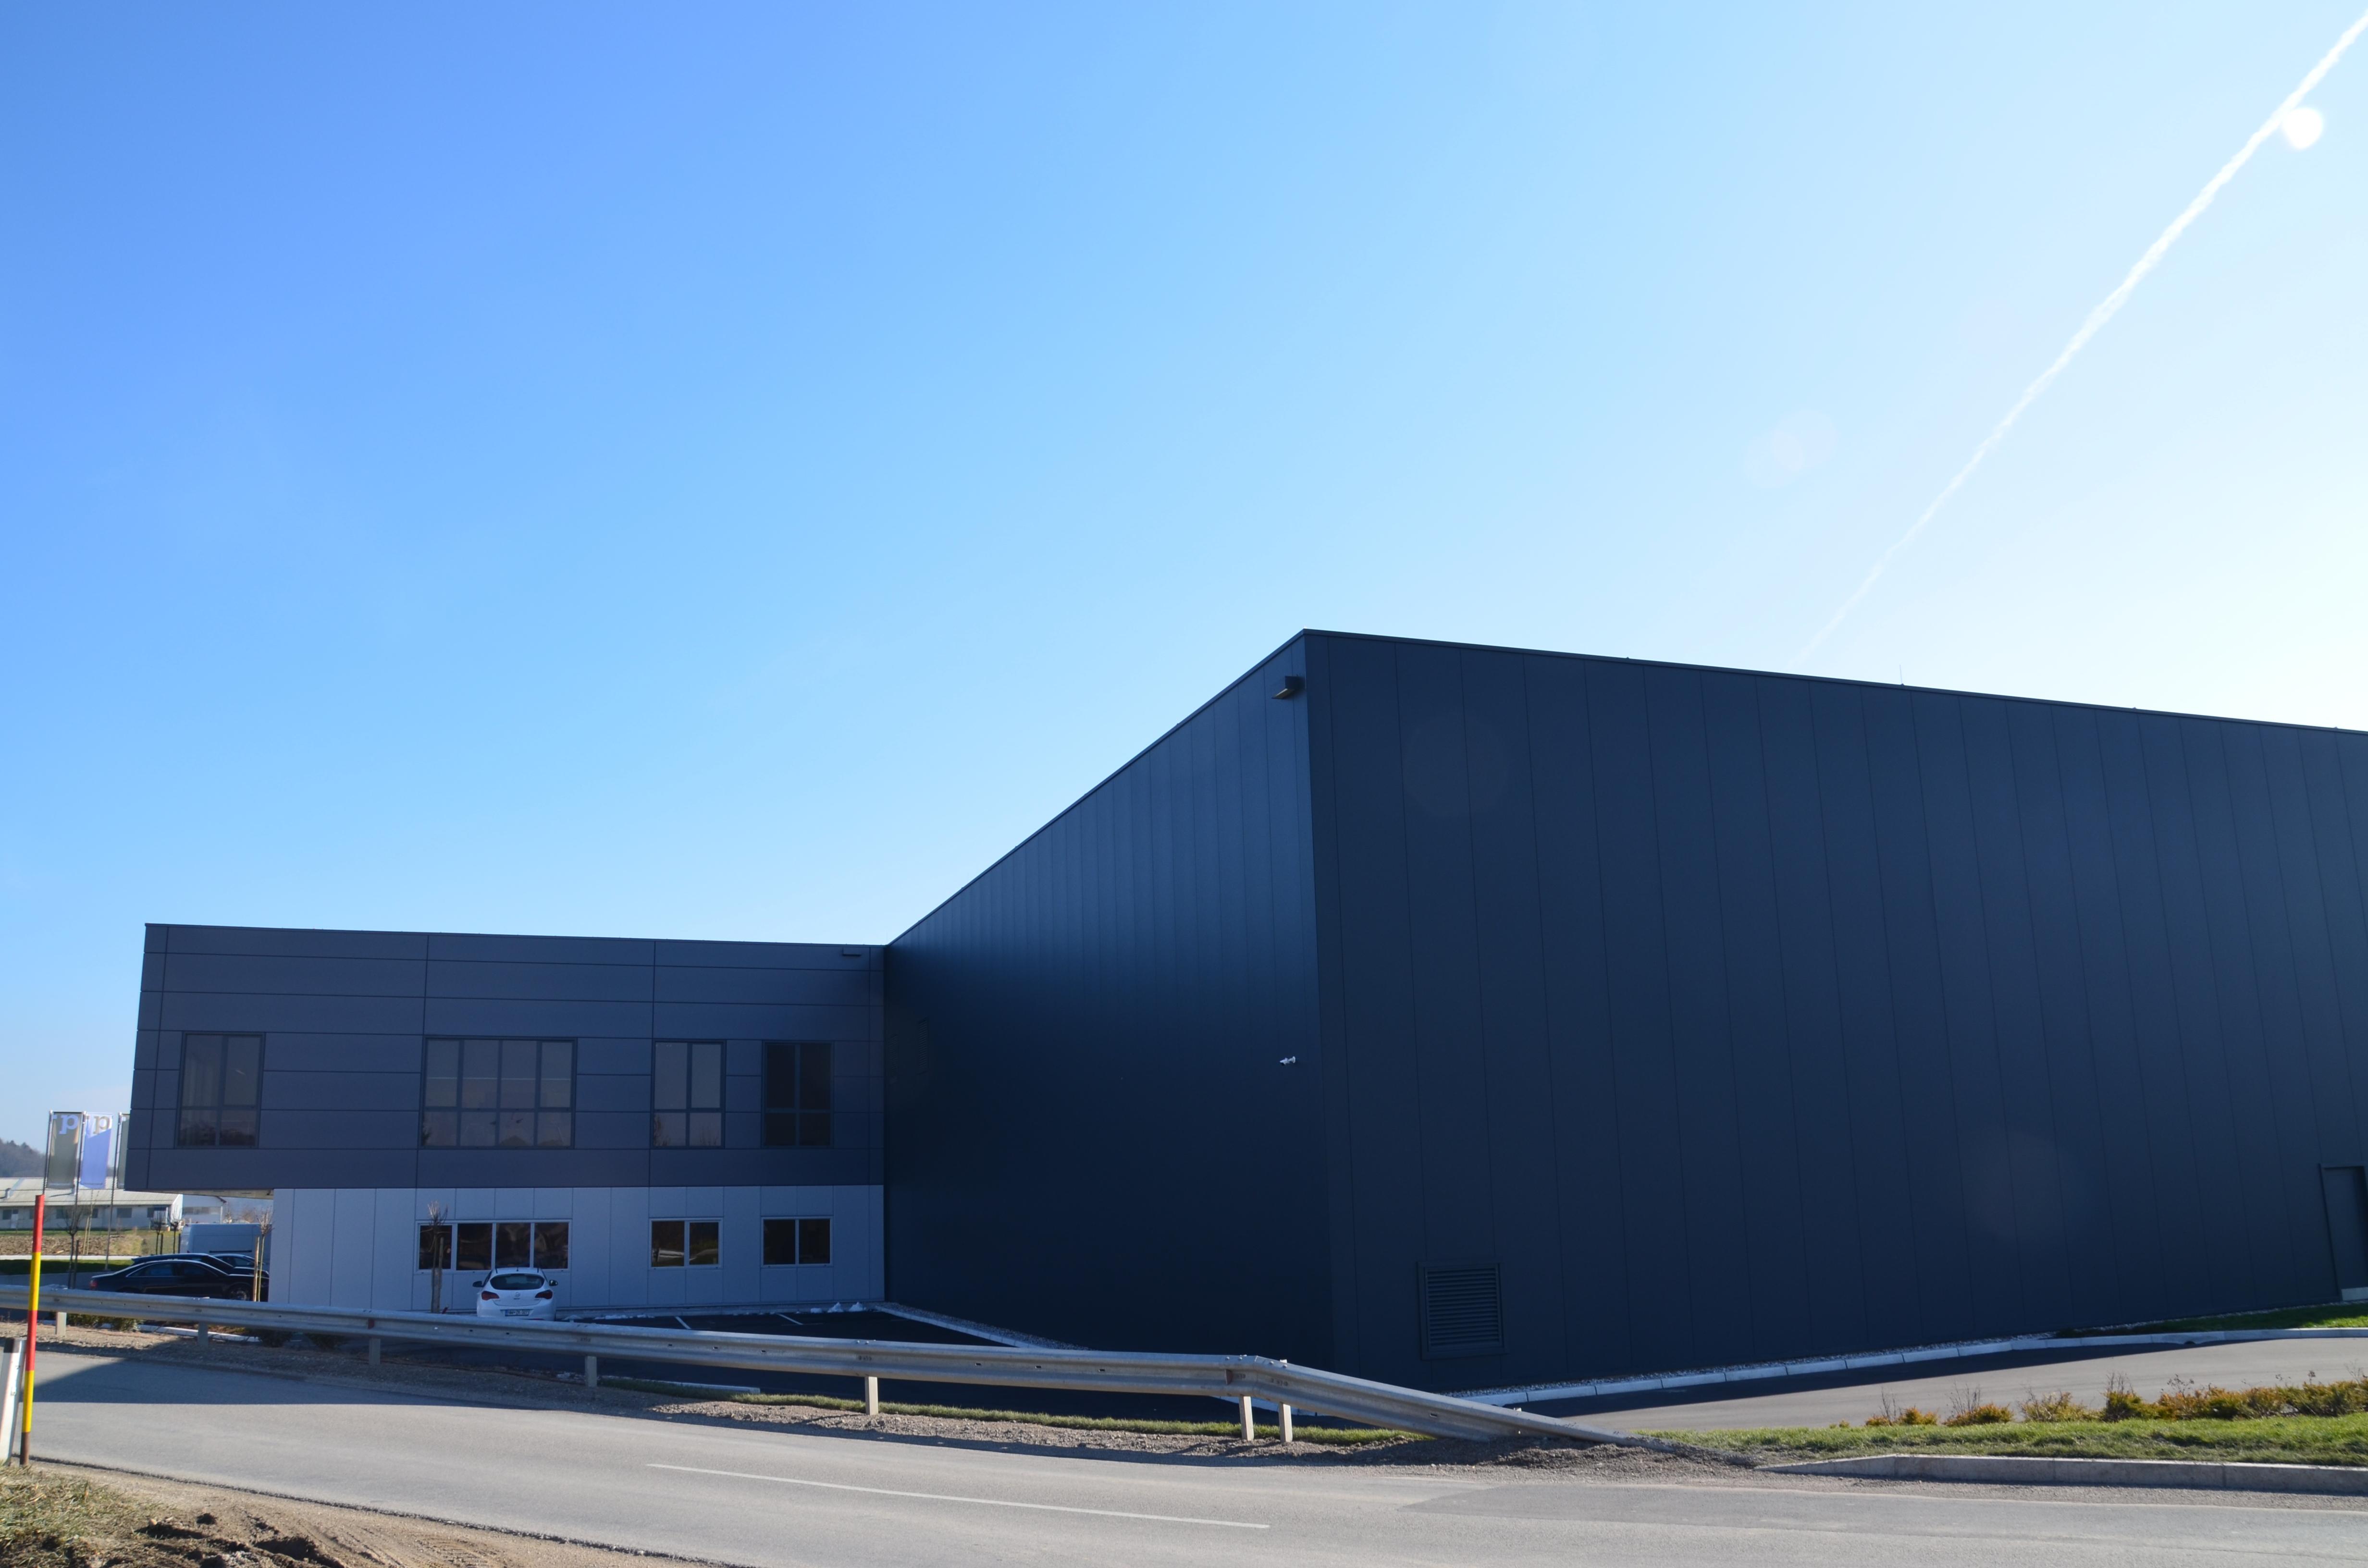 Poslovno-proizvodni objekt Povše metal, Šentrupert